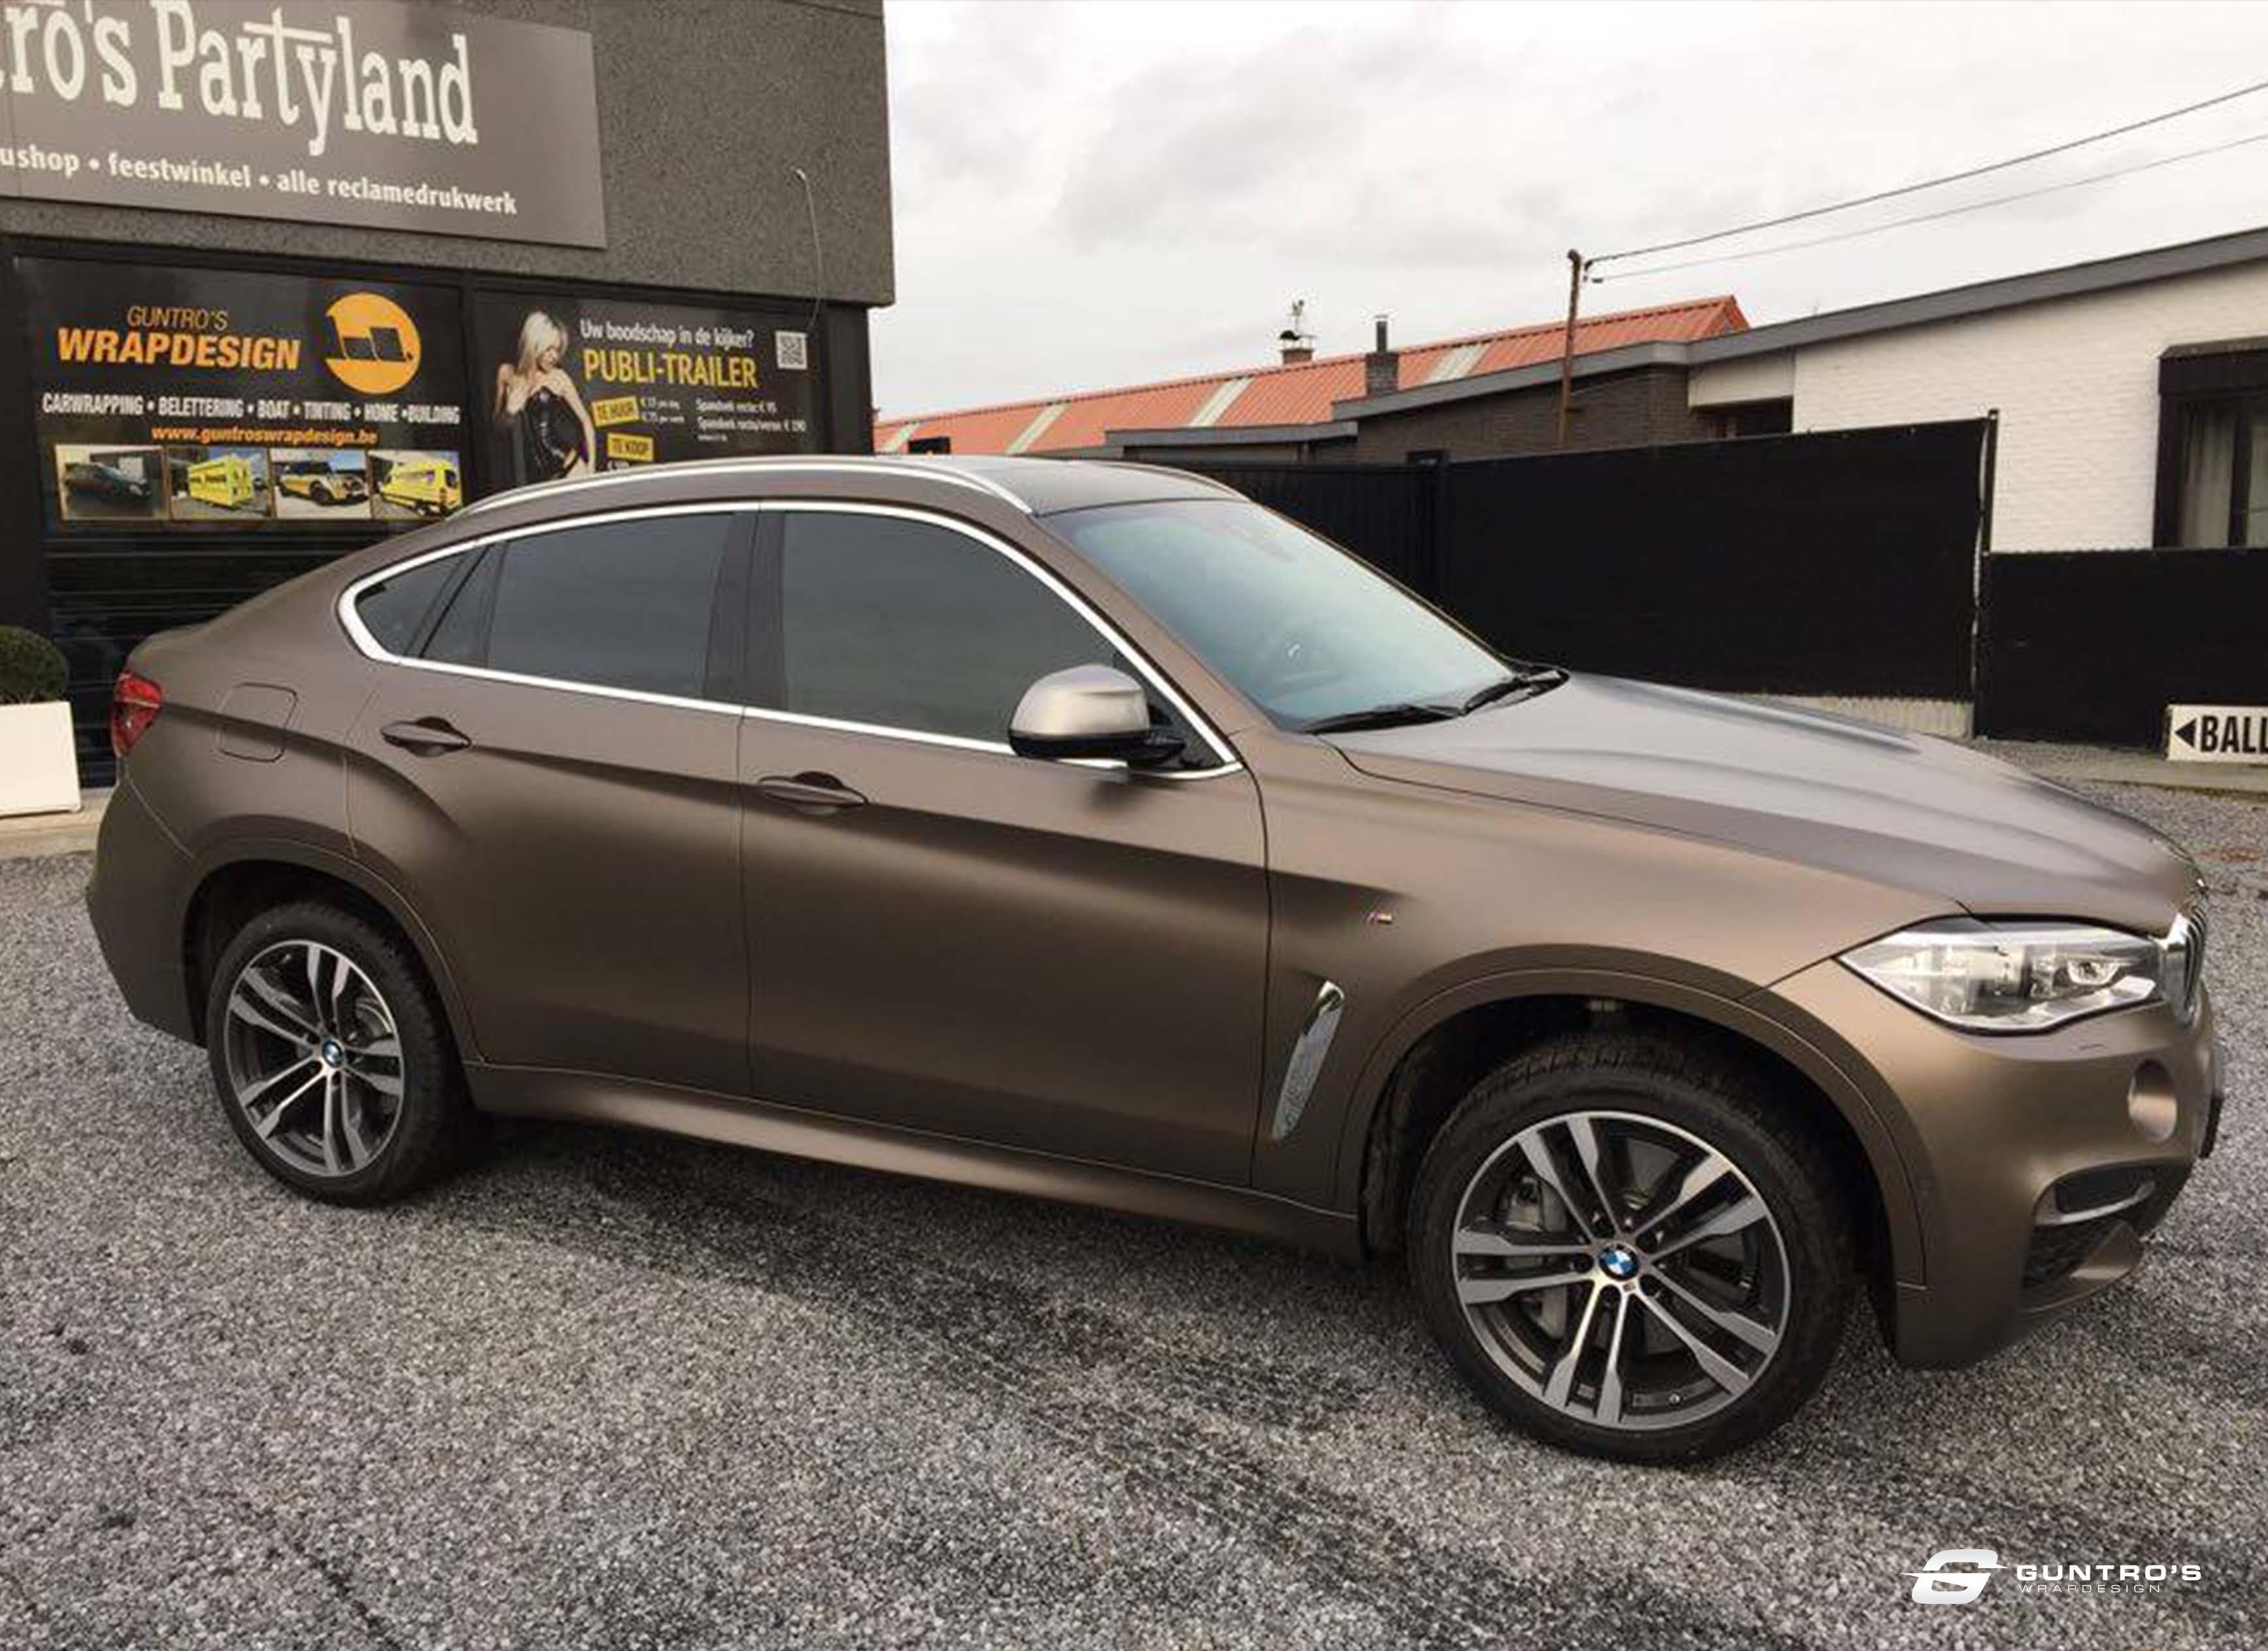 FULL WRAP BMW X6